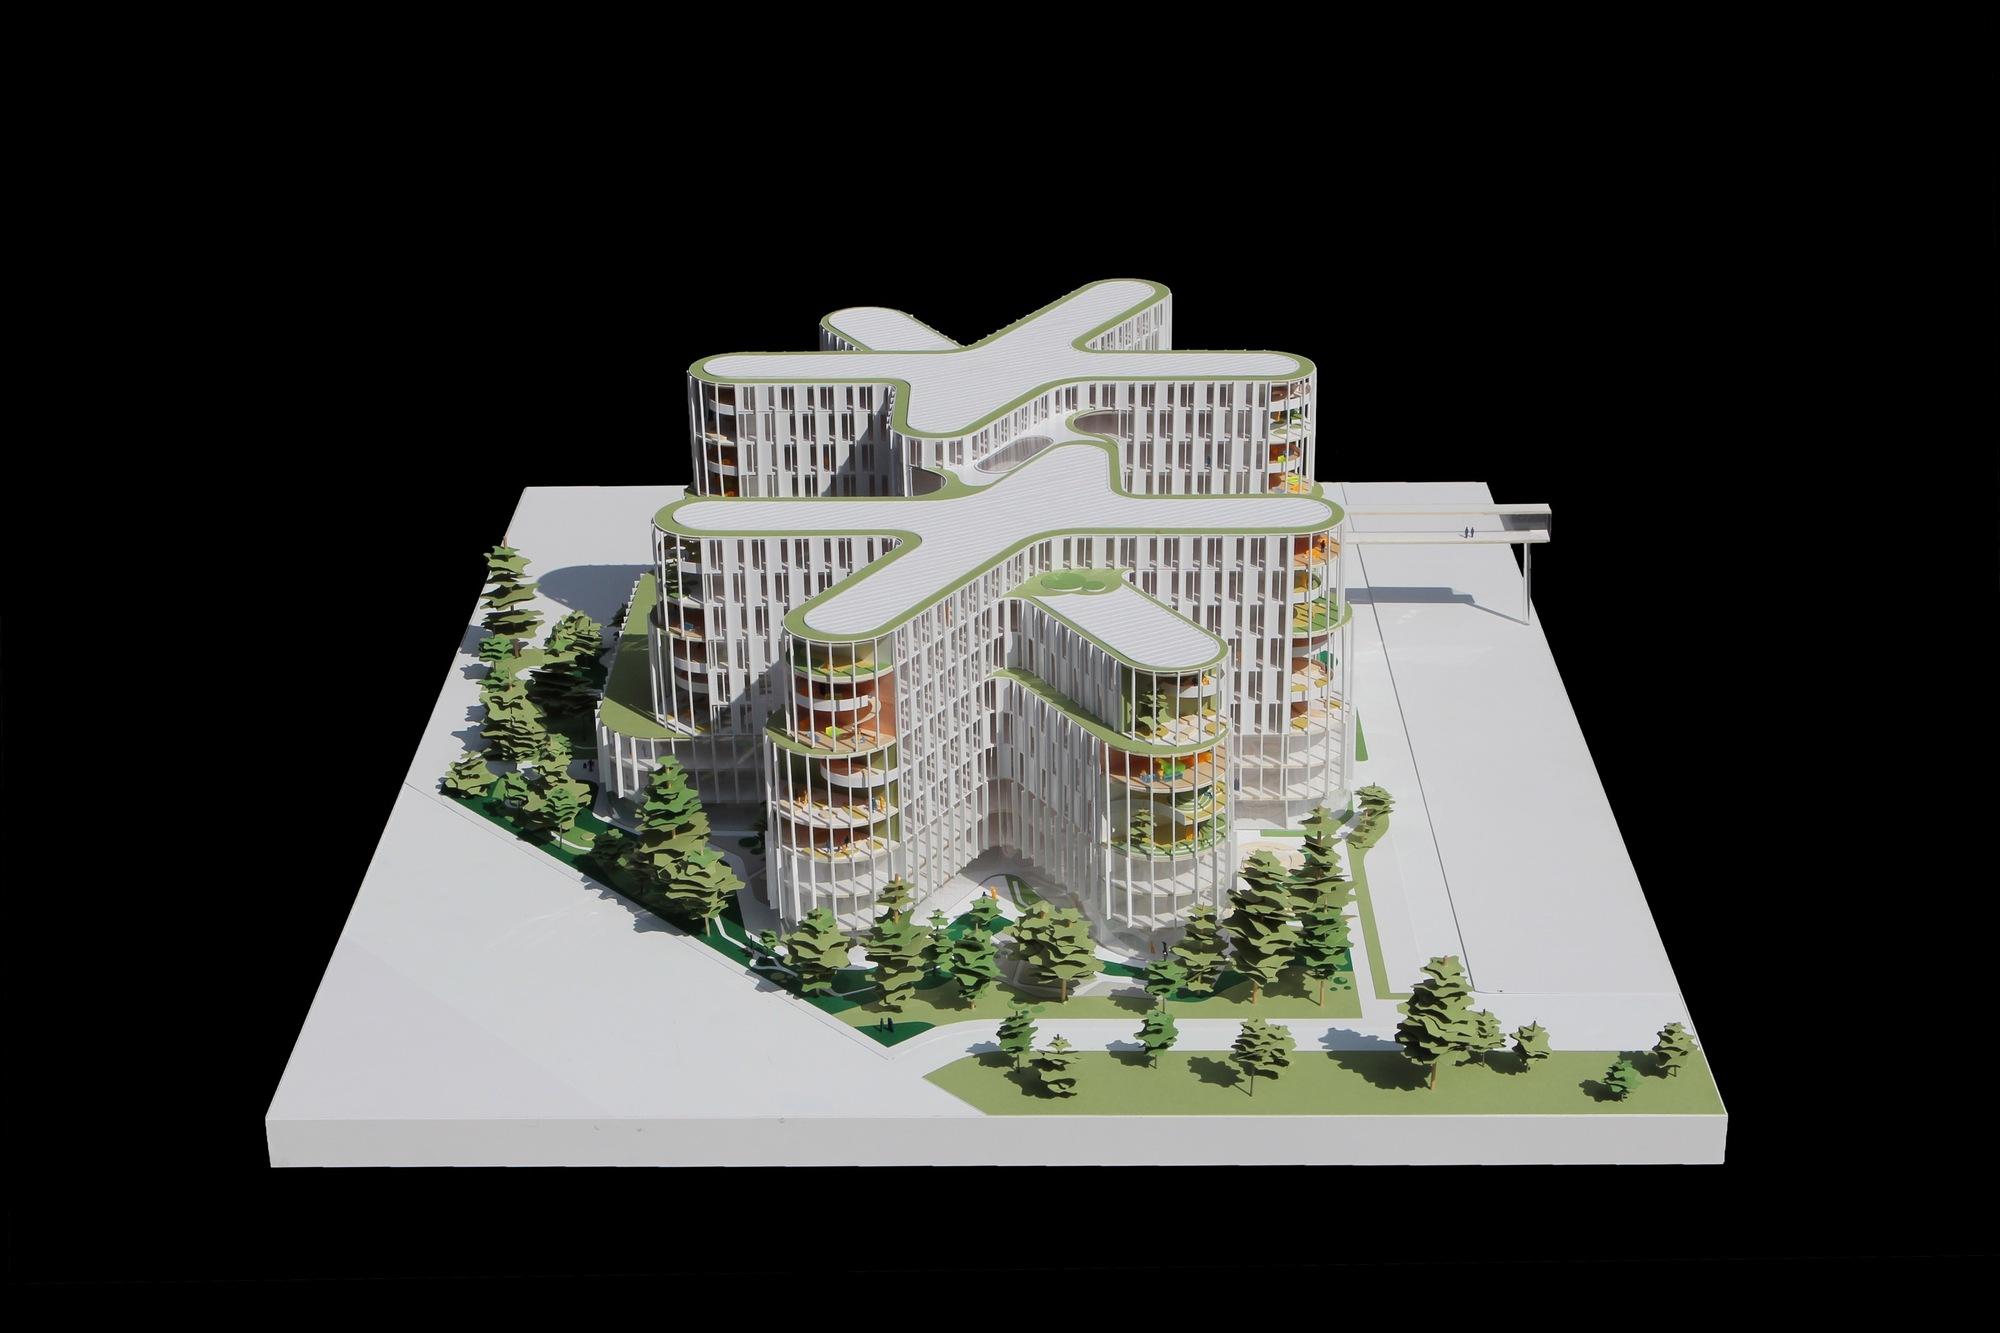 Gallery Of 3xn Wins Competition For Copenhagen Children S